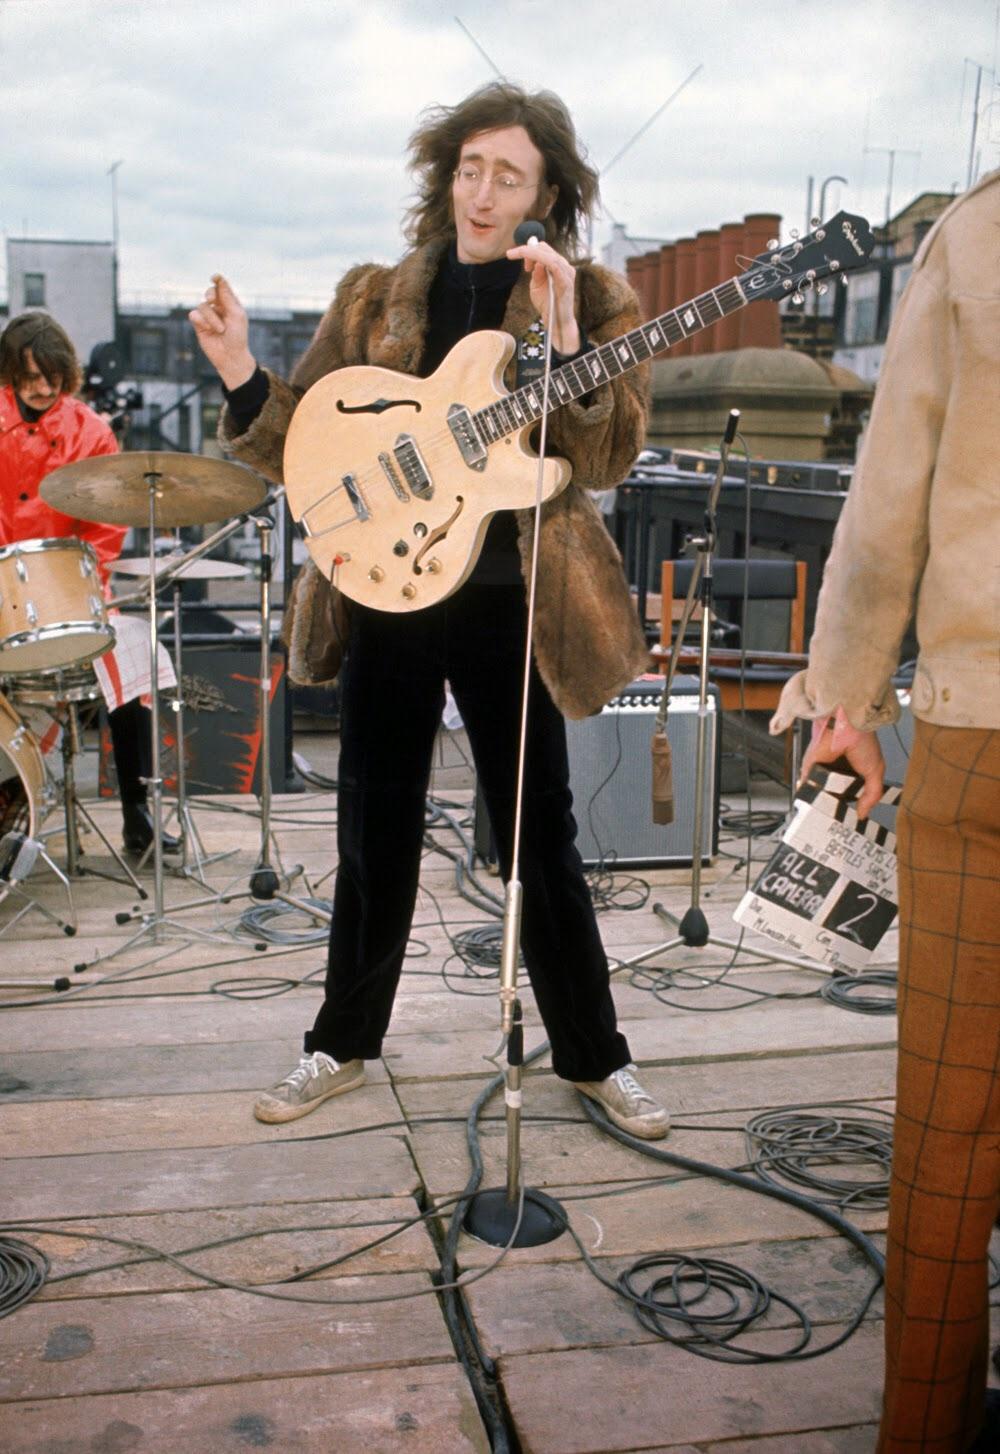 John Lennon on the rooftop of Apple Headquarters, 3 Saville Row, January 30th 1969.